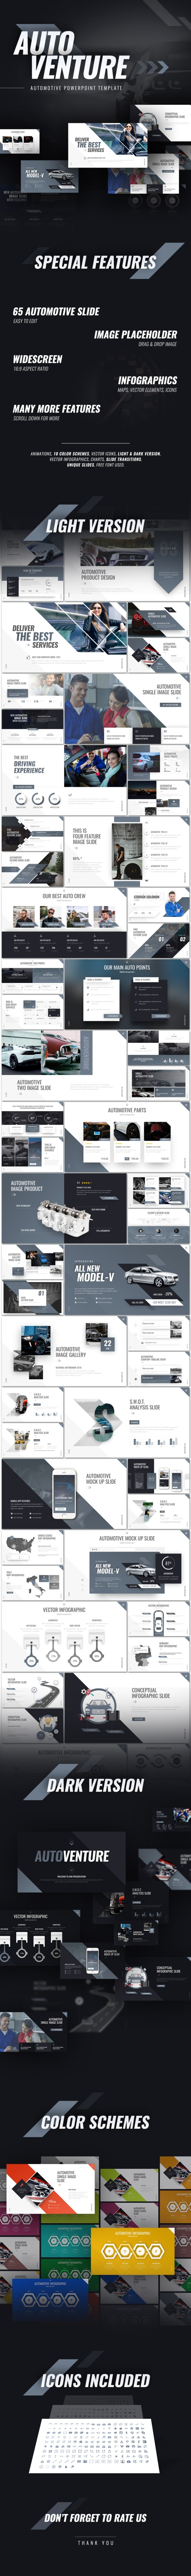 Autoventure Automotive PowerPoint Template - PowerPoint Templates Presentation Templates